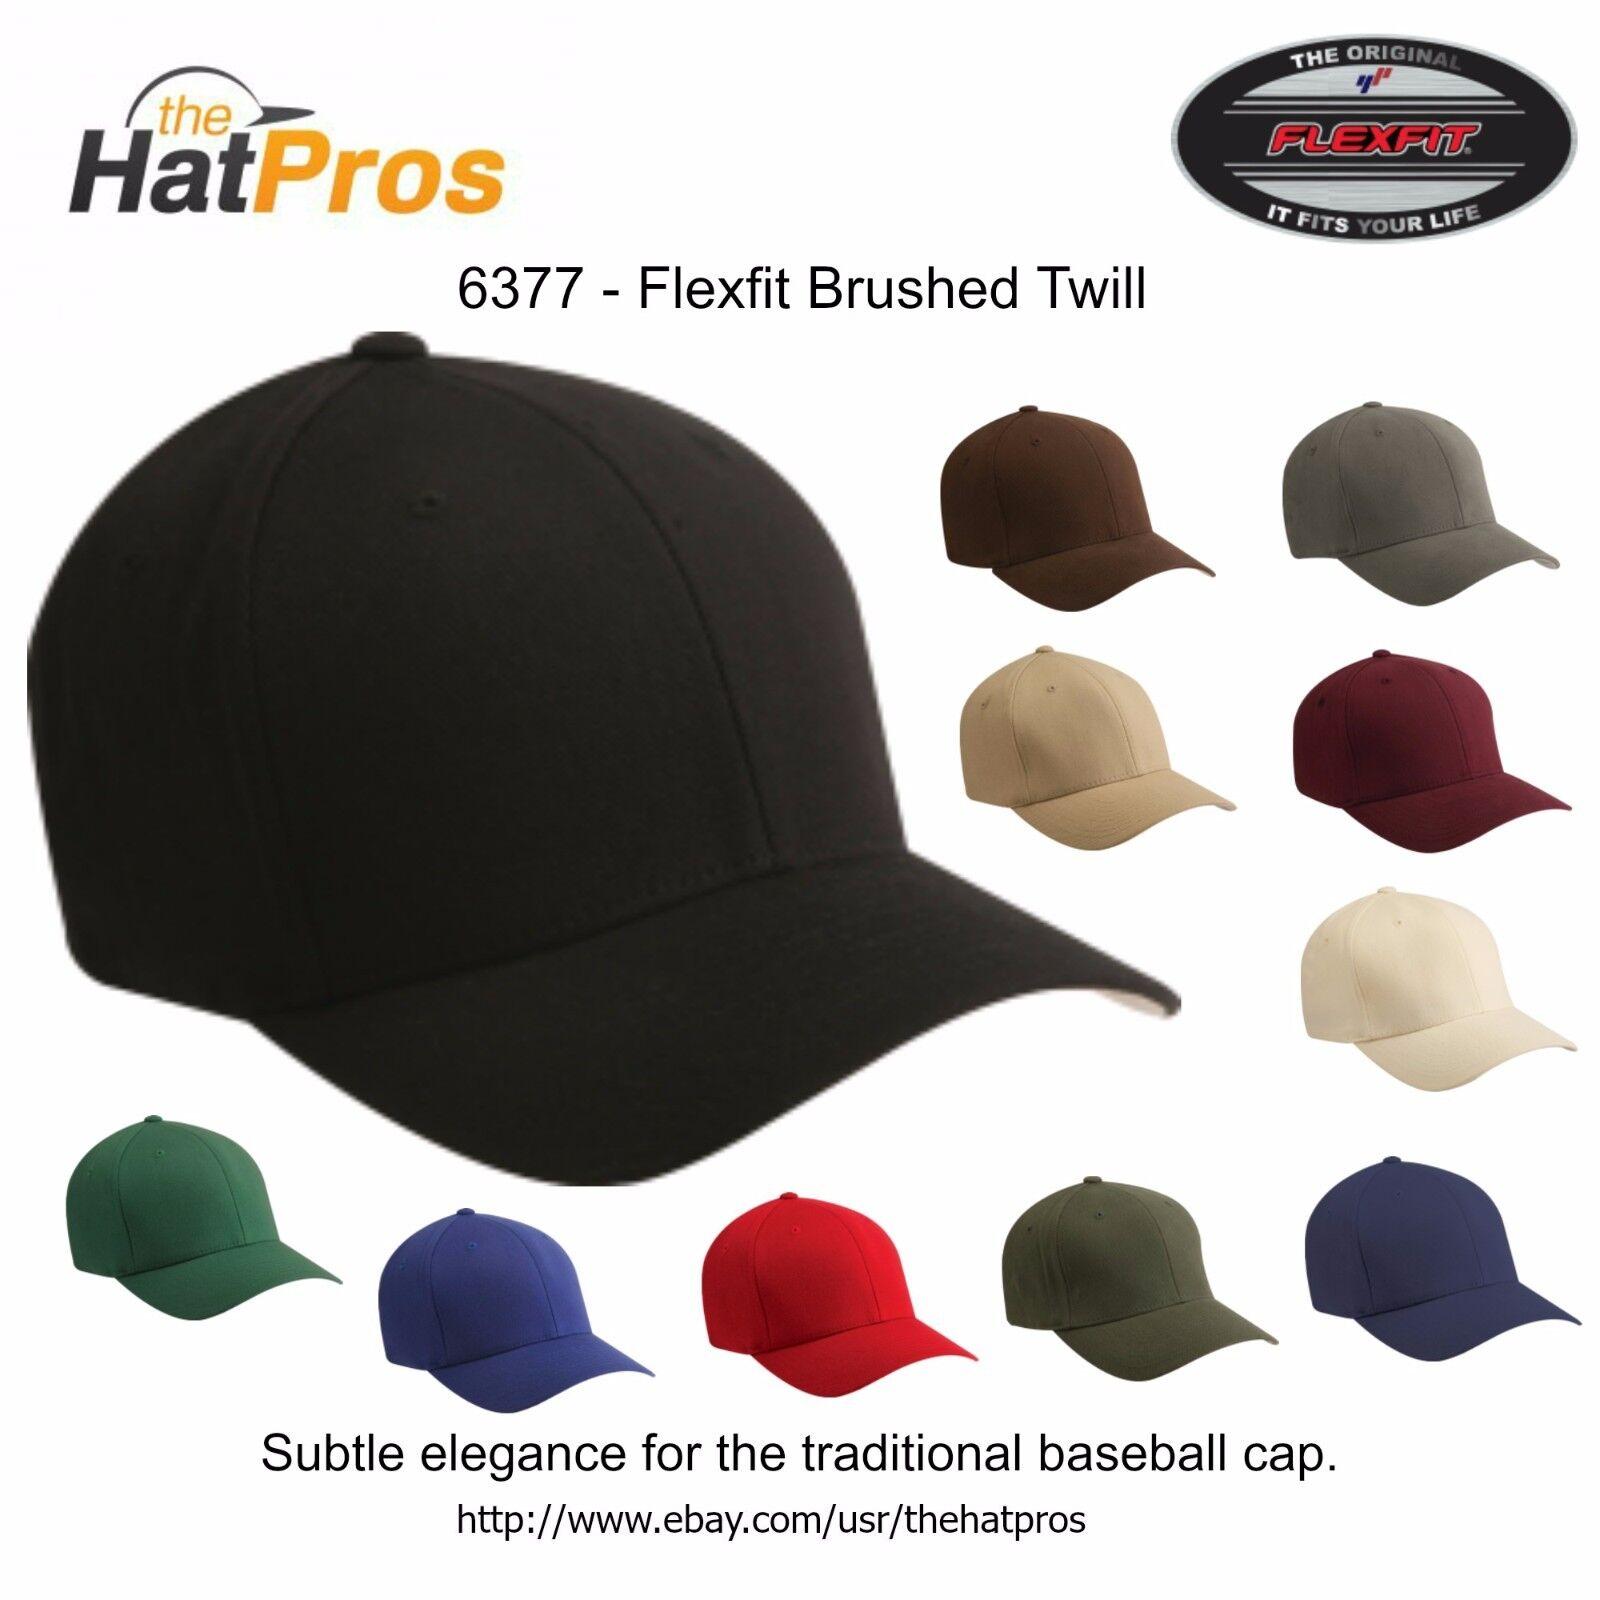 Изображение товара 6377 Authentic Flexfit® Men's Brushed Twill Fitted Hat All Colors S/M & L/XL